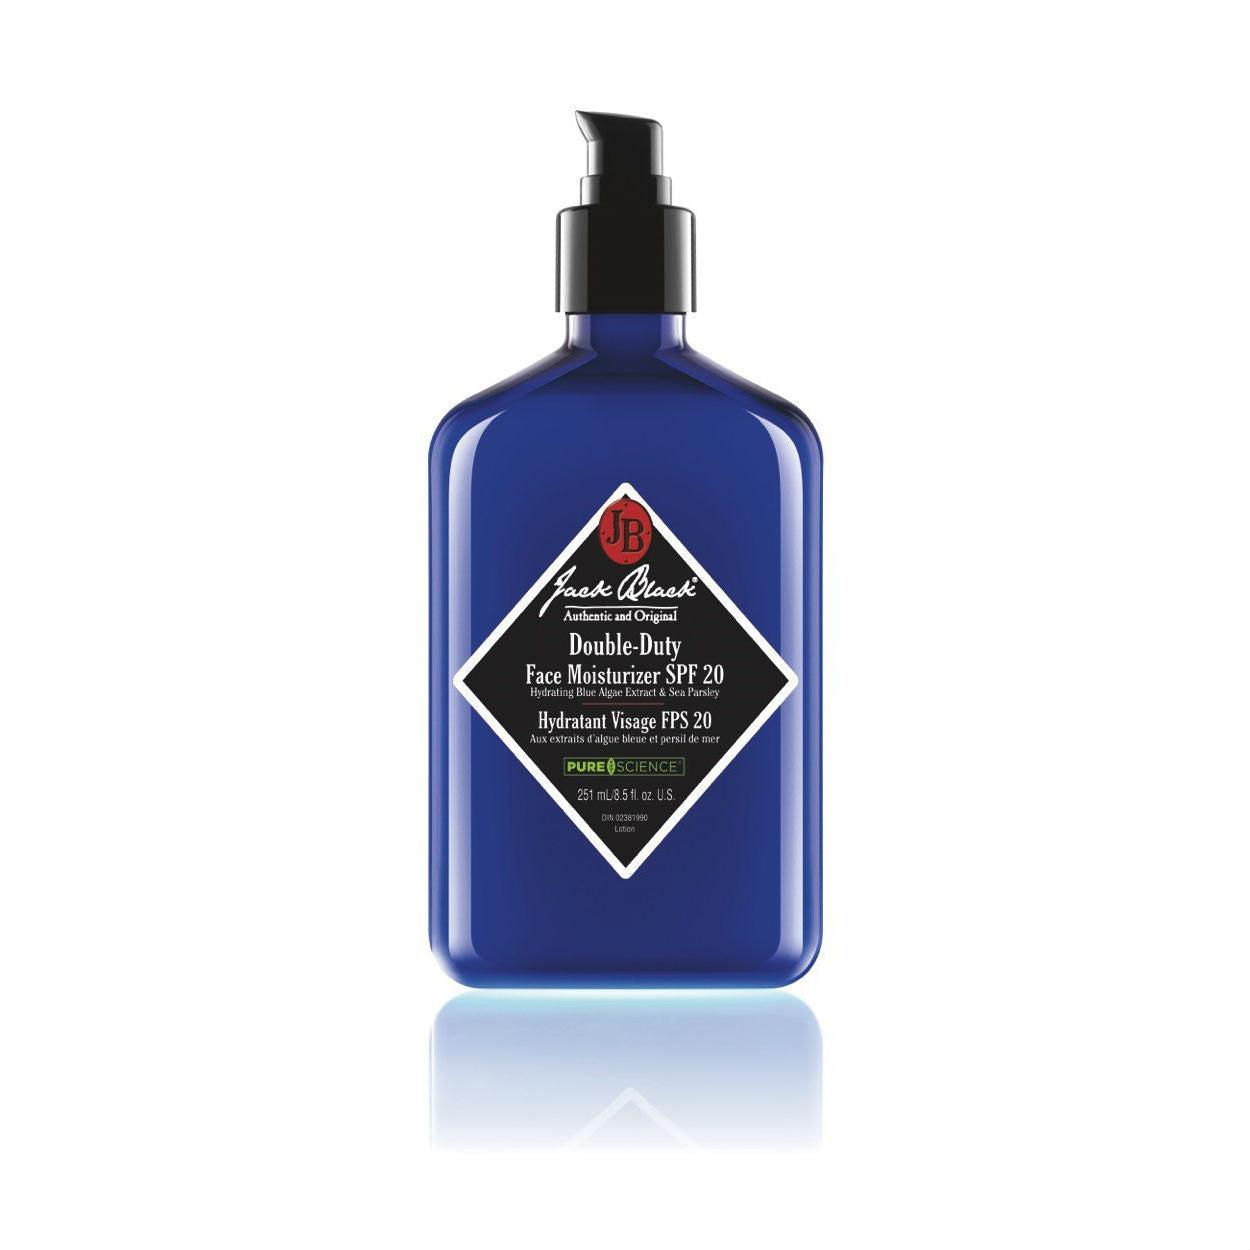 jack black moisturizer and cleanser set review